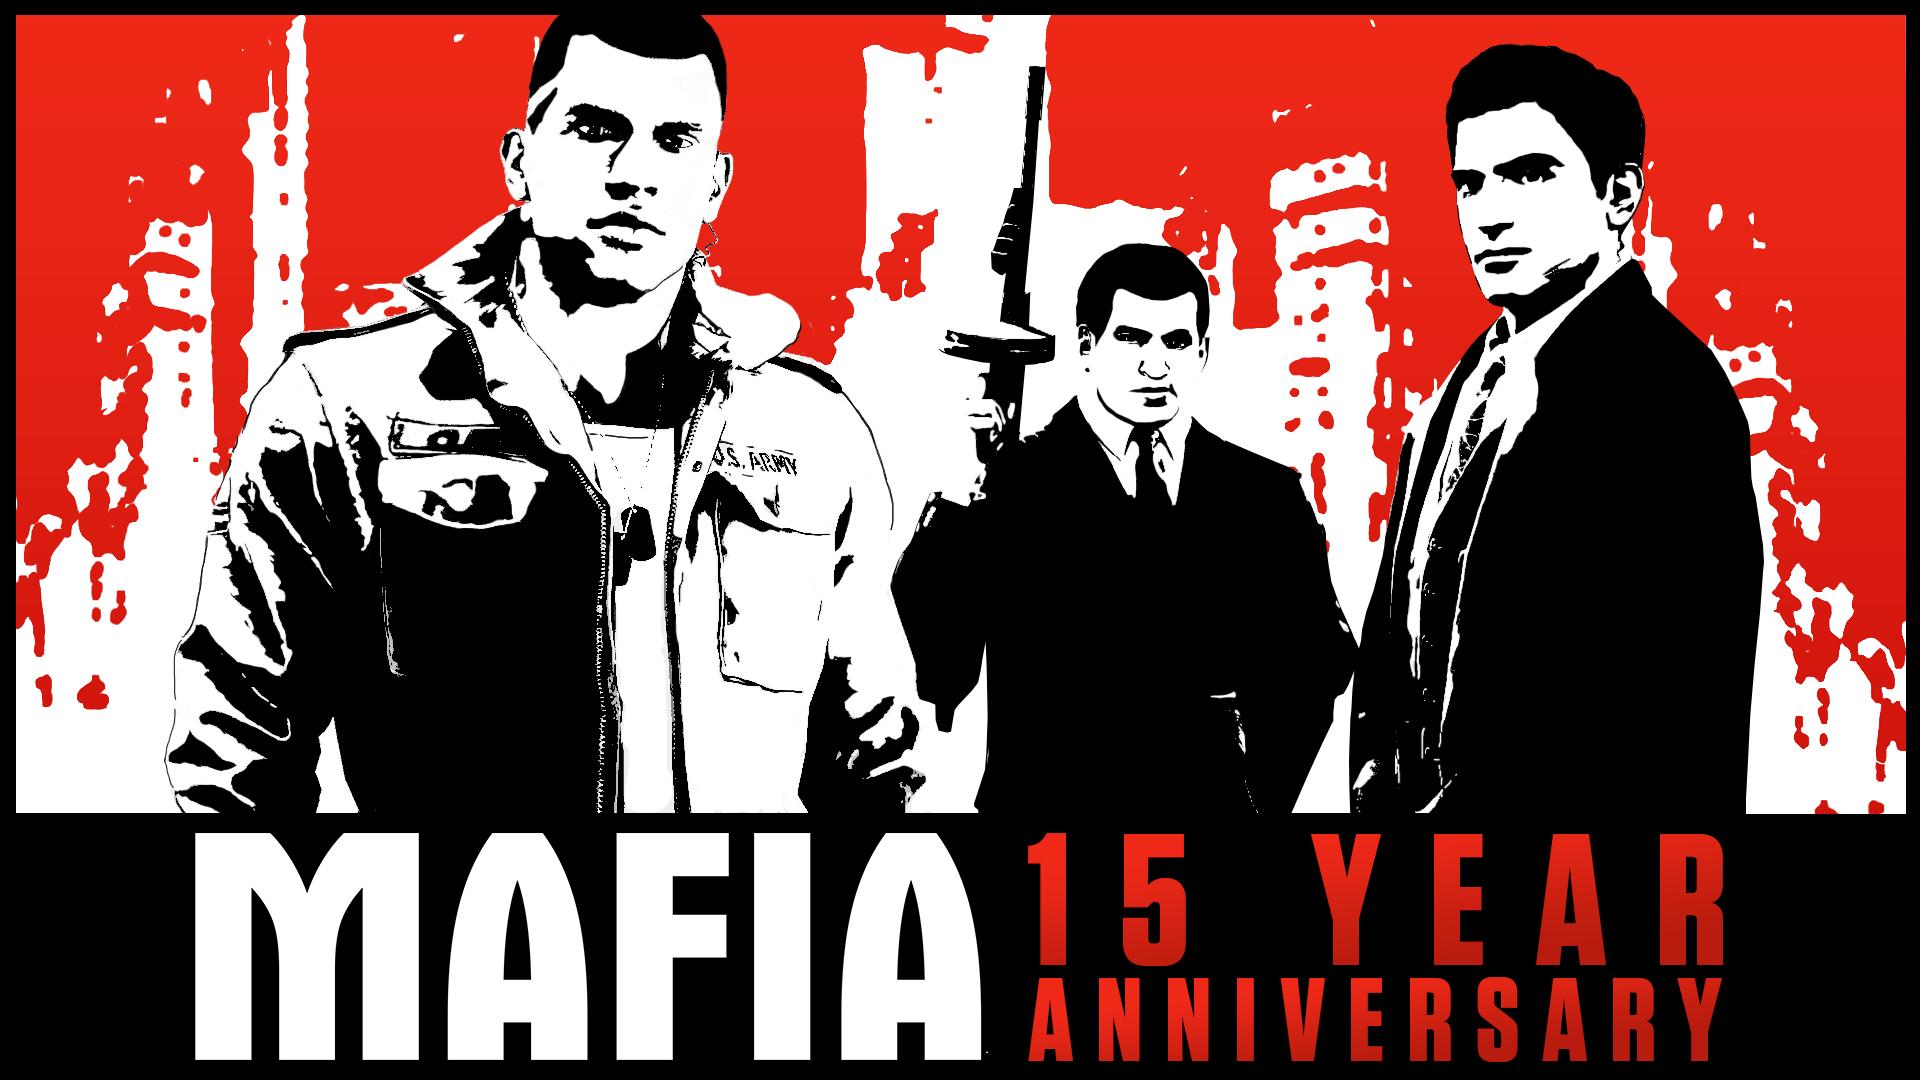 Юбилейный трейлер франшизы Mafia